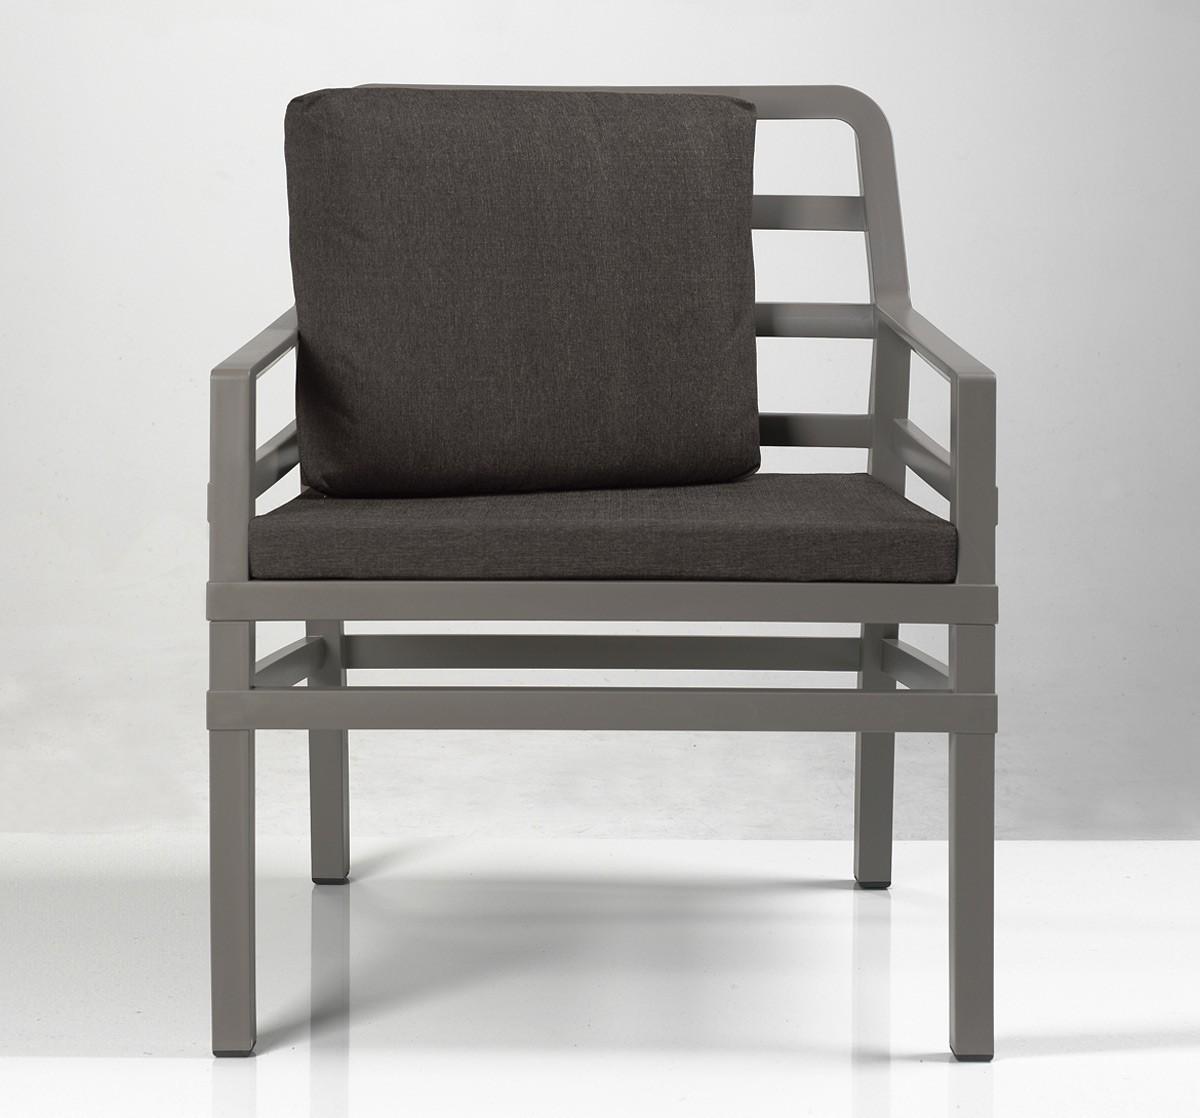 gartensessel sofa lounge aria kunststoff grau braun kissen kaffee bei. Black Bedroom Furniture Sets. Home Design Ideas